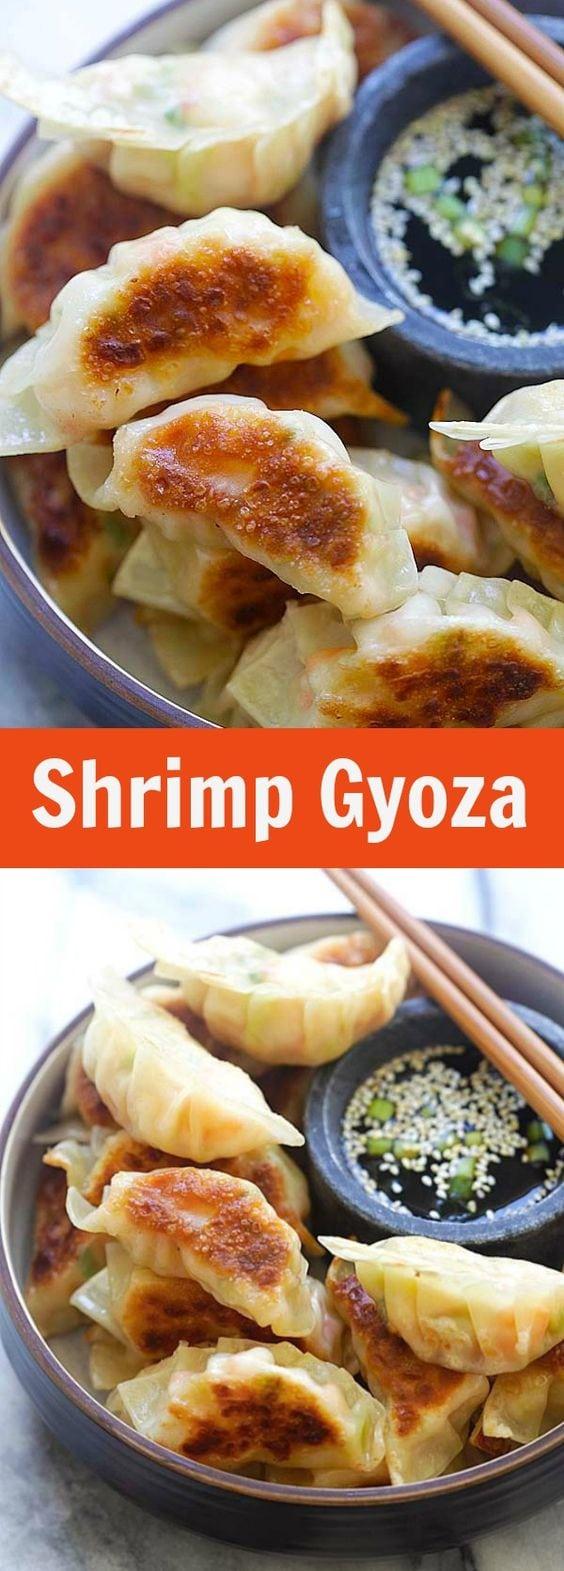 Shrimp Gyoza - amazing Japanese gyoza dumplings filled with shrimp and cabbage. Crispy, juicy and so easy to make at home. | rasamalaysia.com